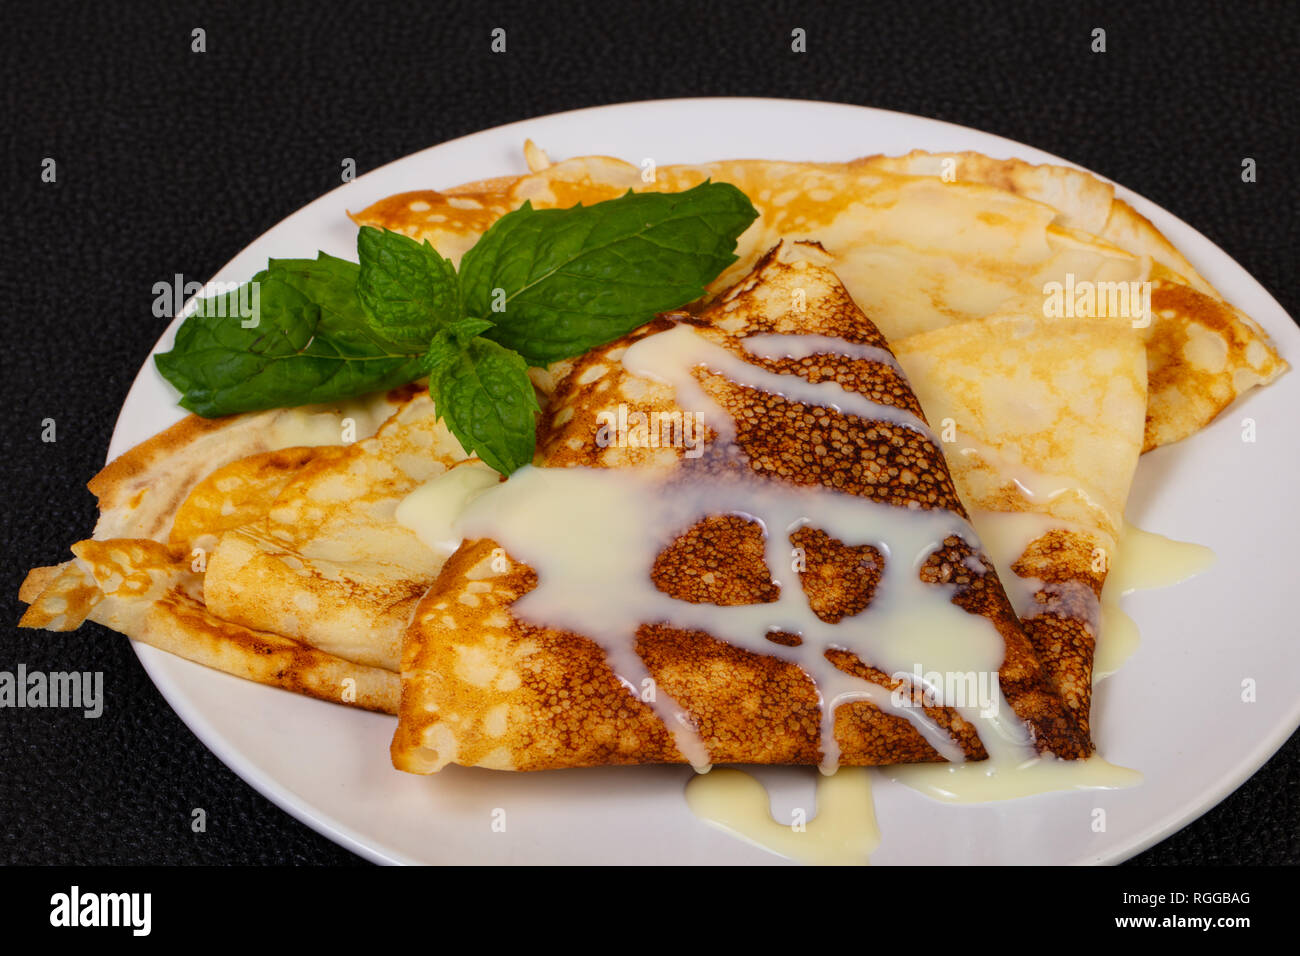 Hot Pancake with condensed milk - Stock Image